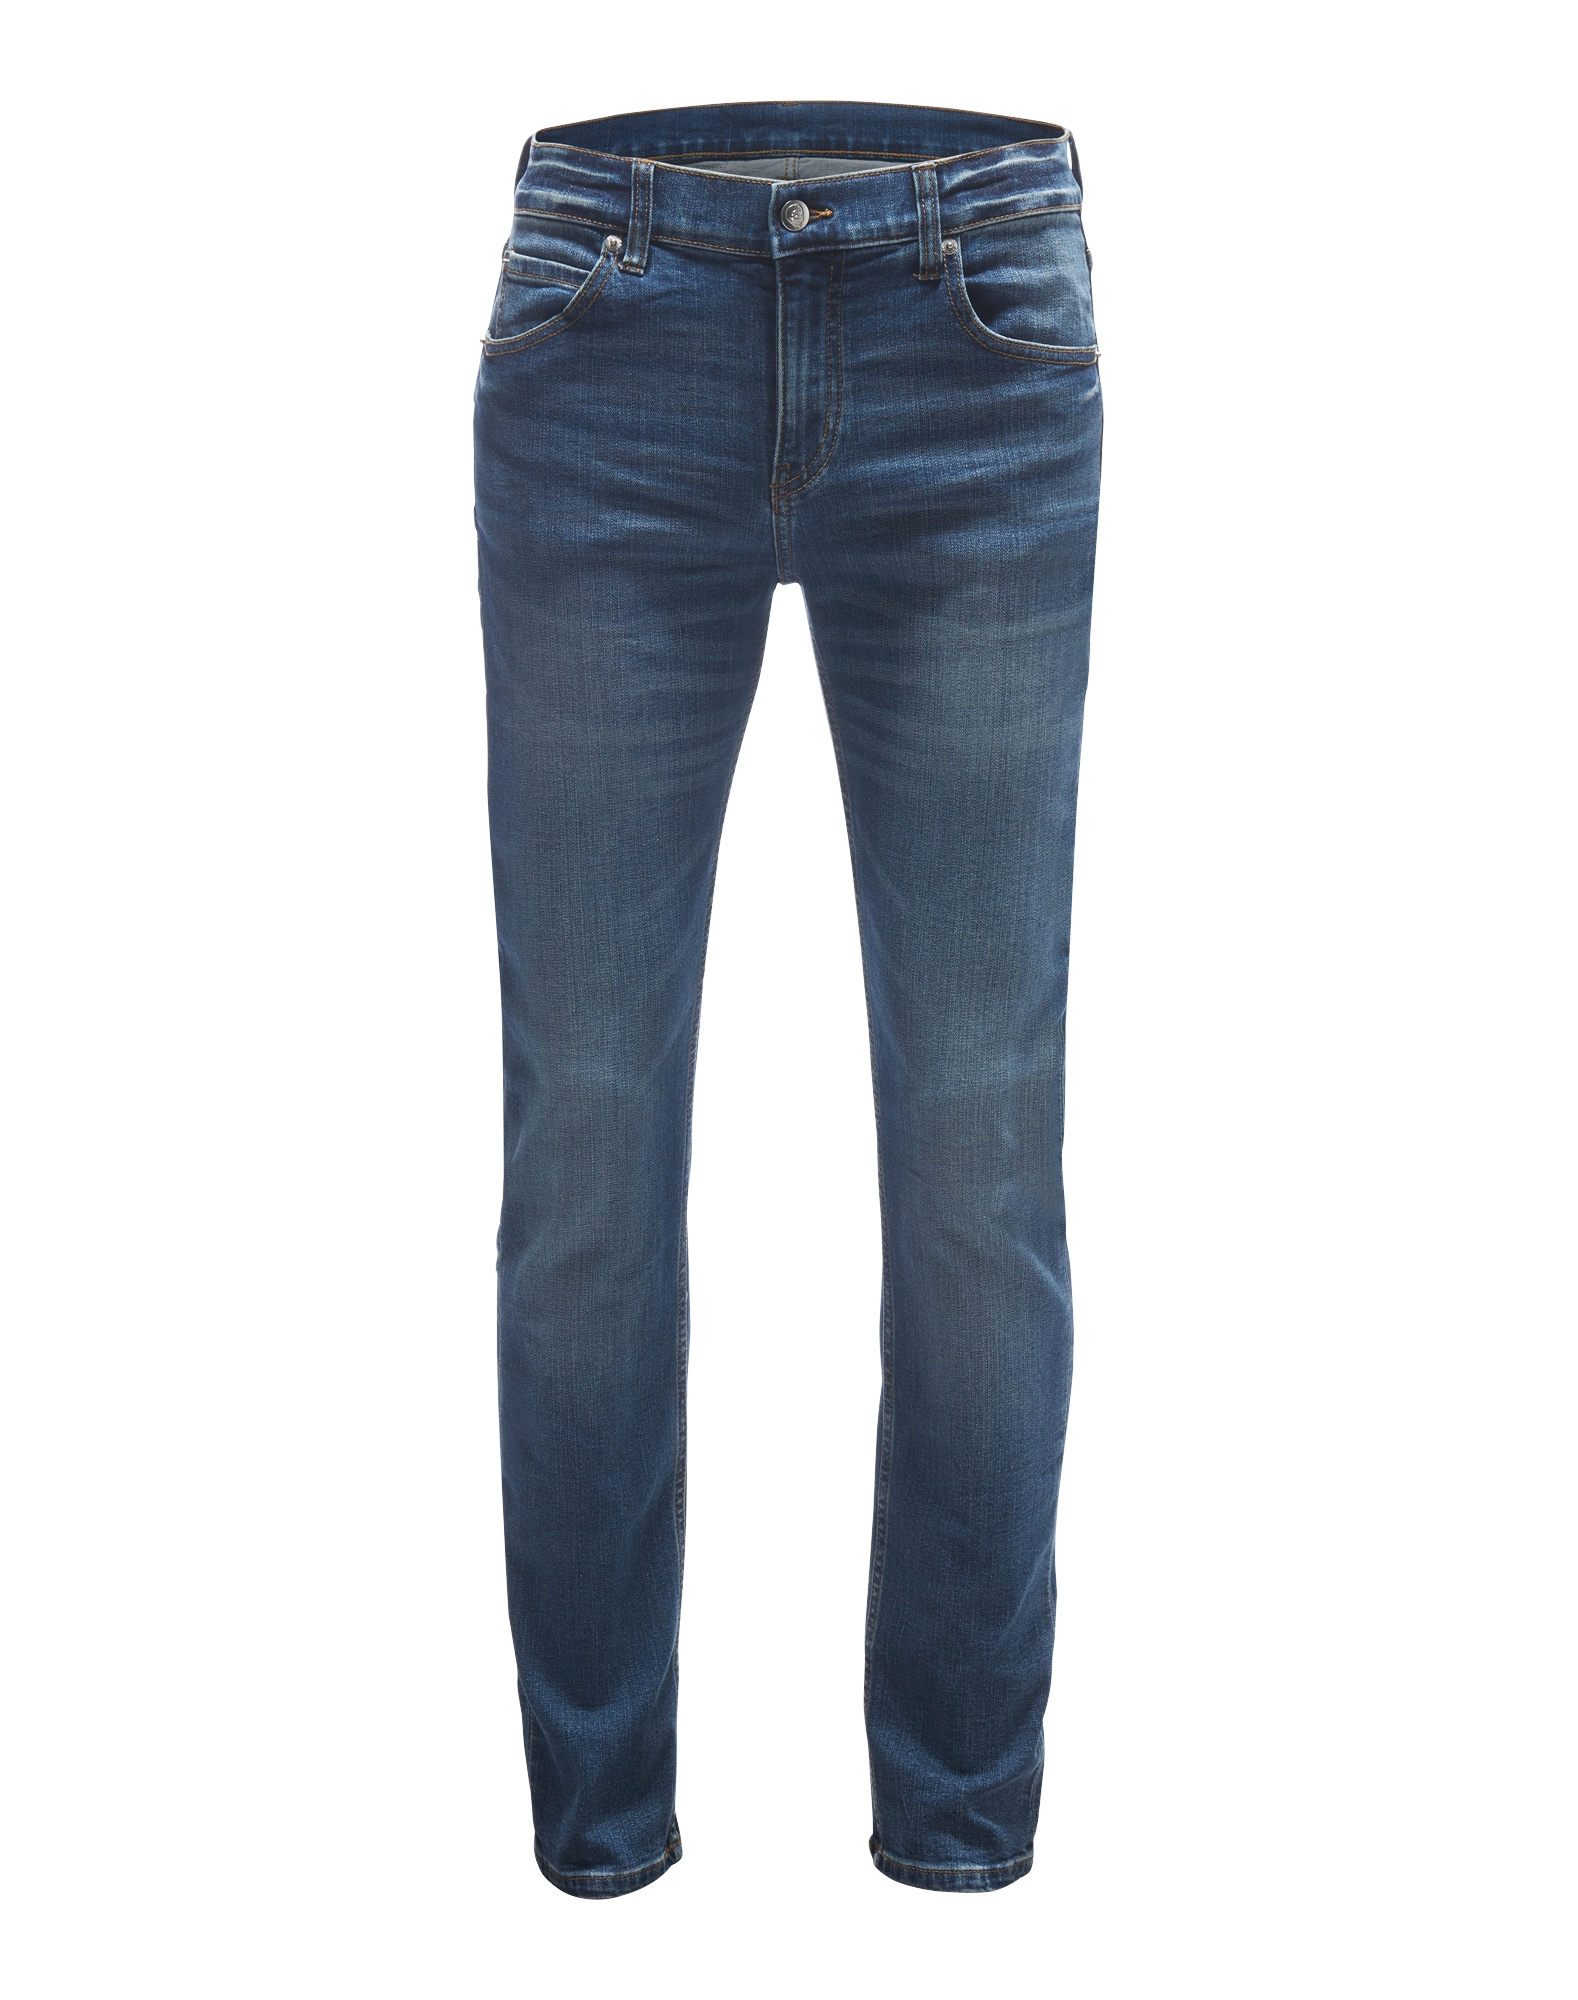 CHEAP MONDAY Heren Jeans indigo